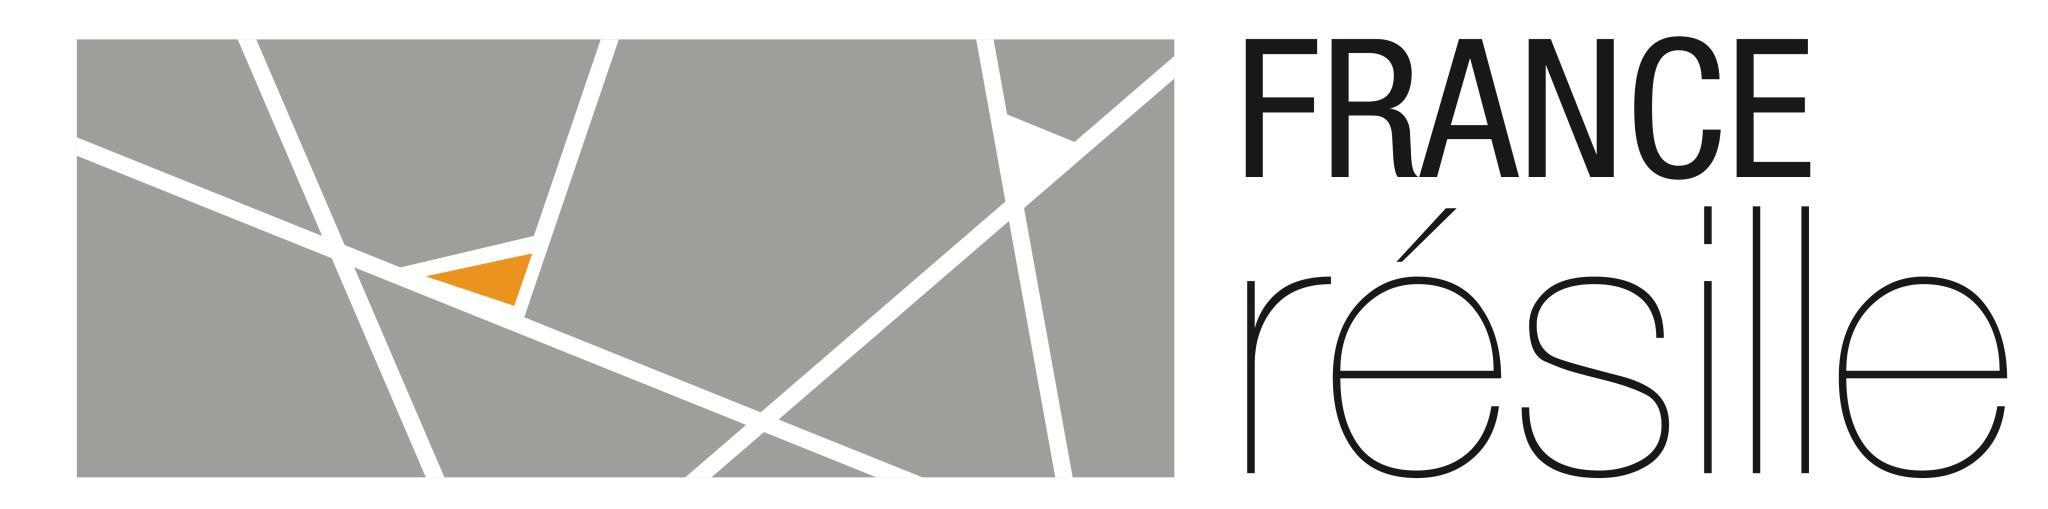 France Résille Logo.jpg